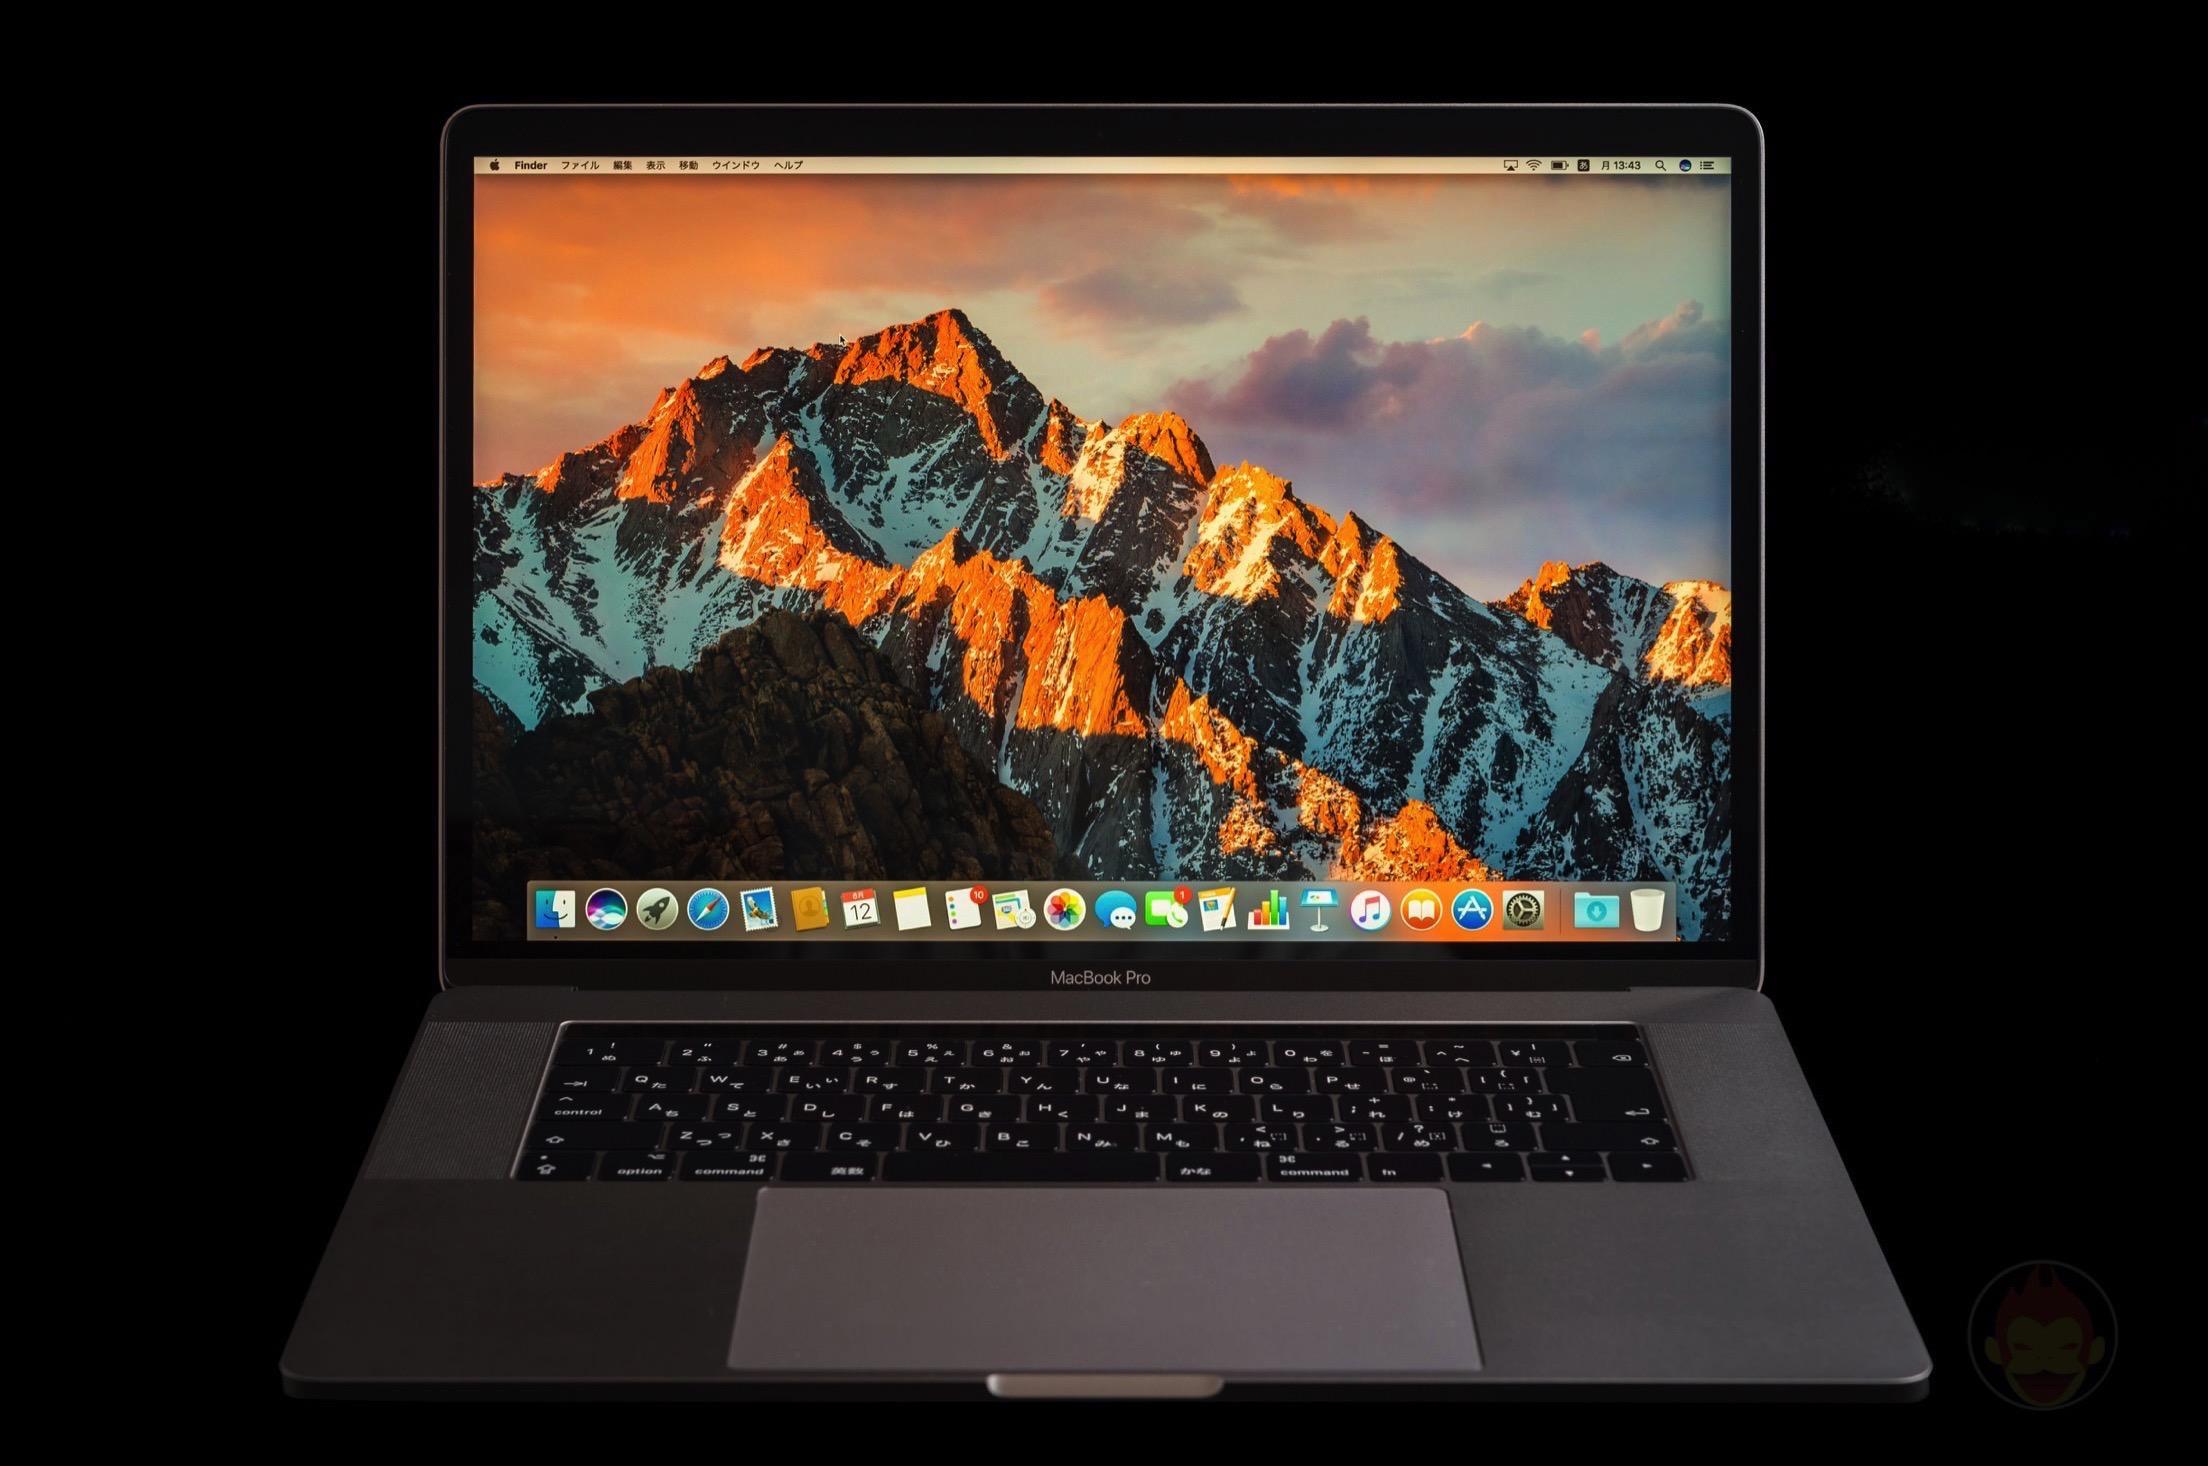 MacBook-Pro-15inch-2017-Yamasha-01.jpg